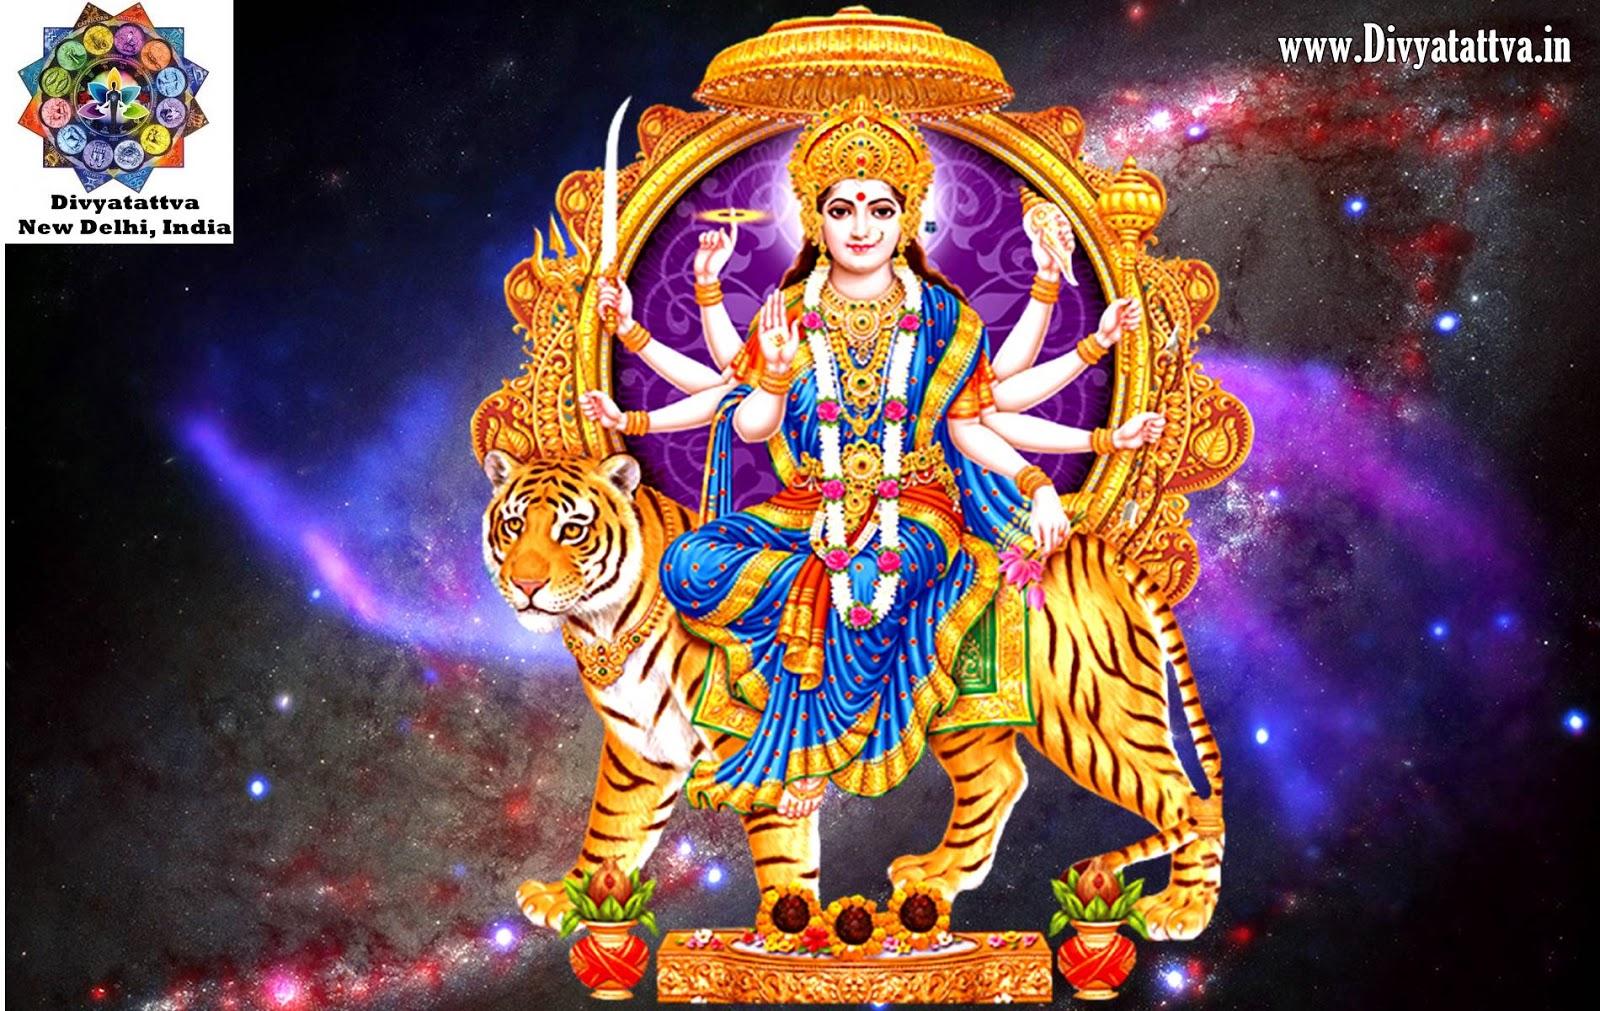 Hindu God Devi Photos - YouTube